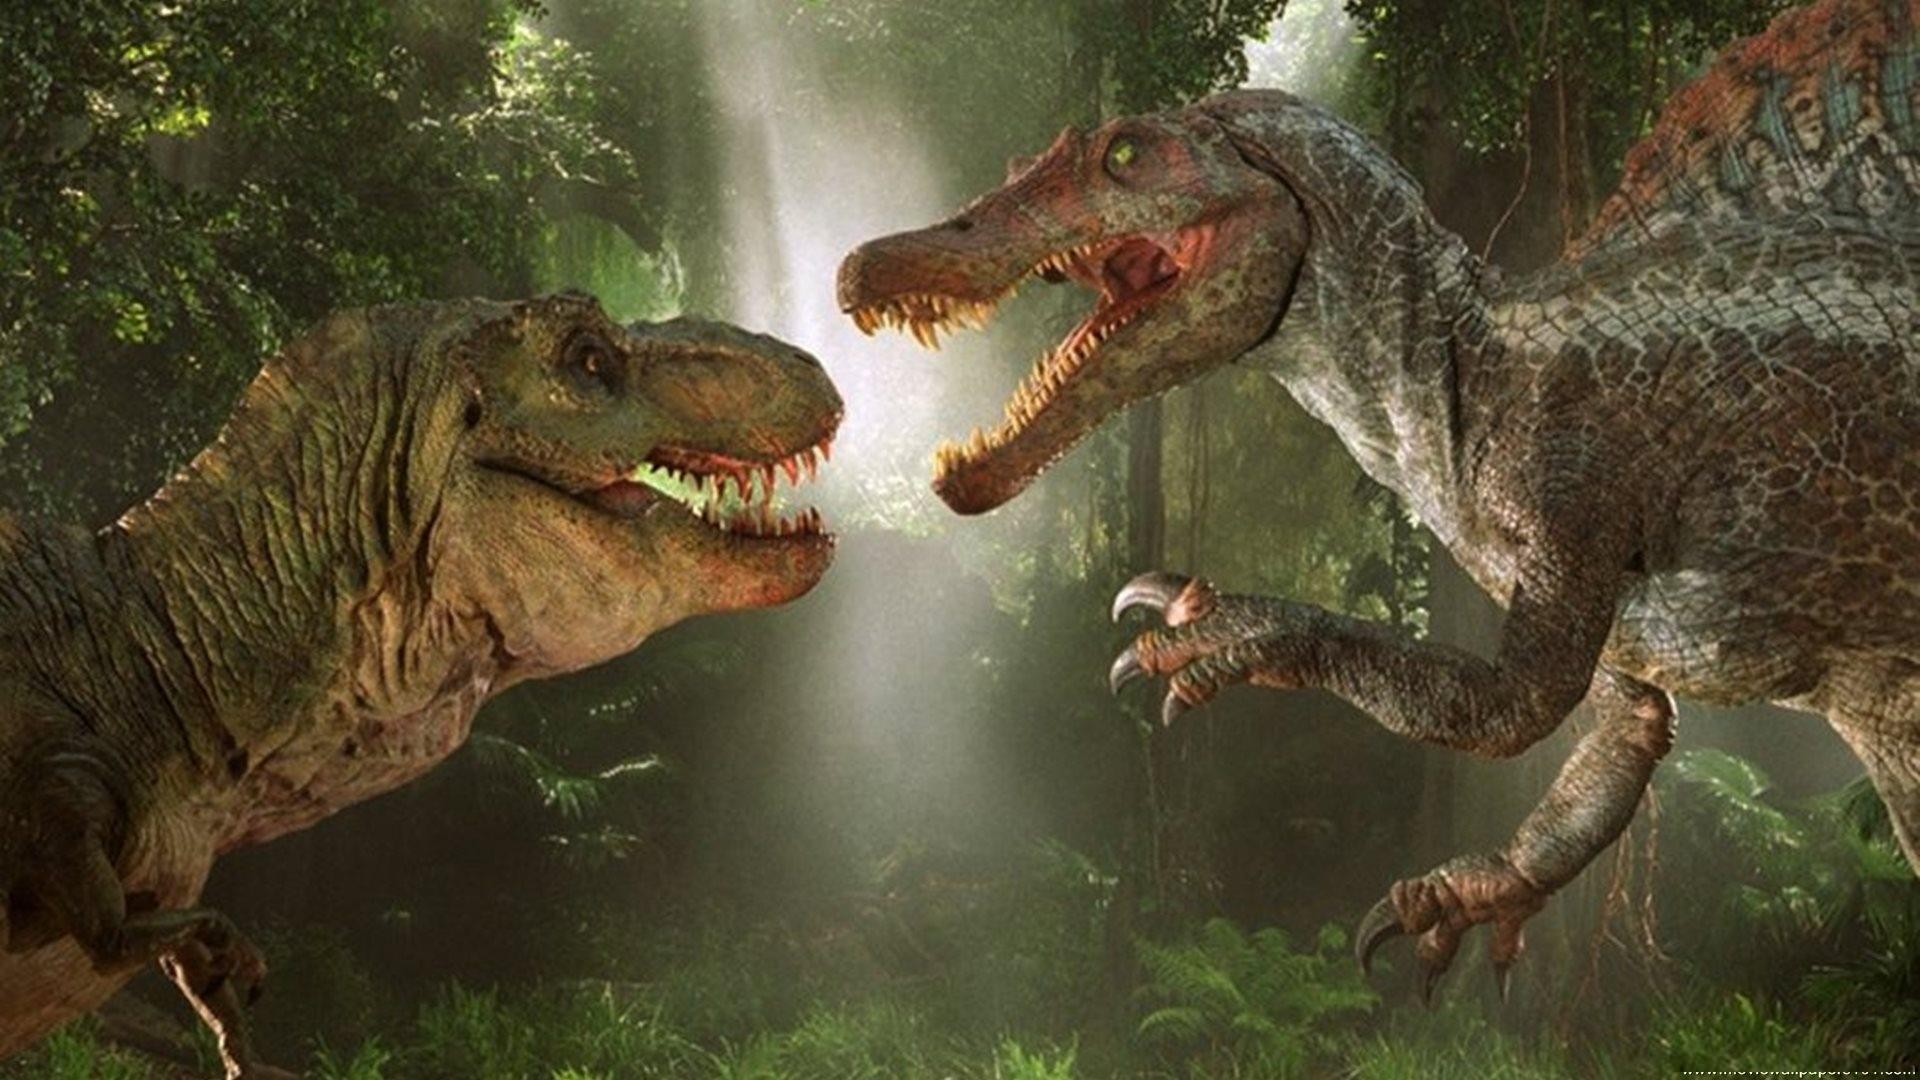 Free Download Jurassic World Dinosaurs Wallpaper